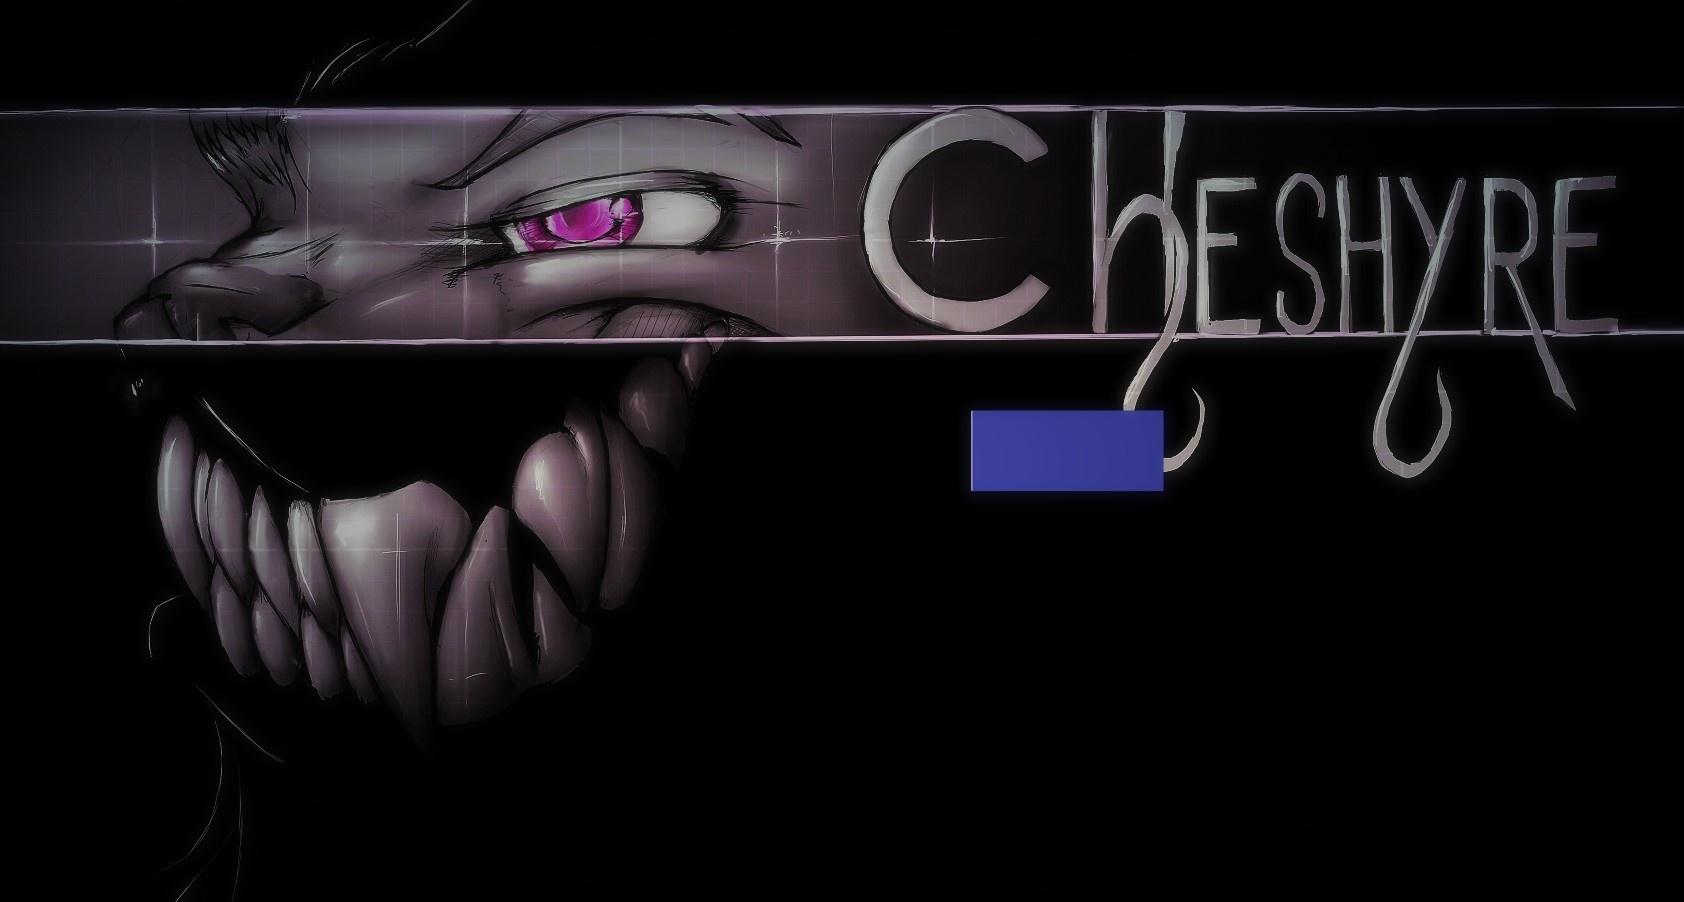 cheshyre Cover